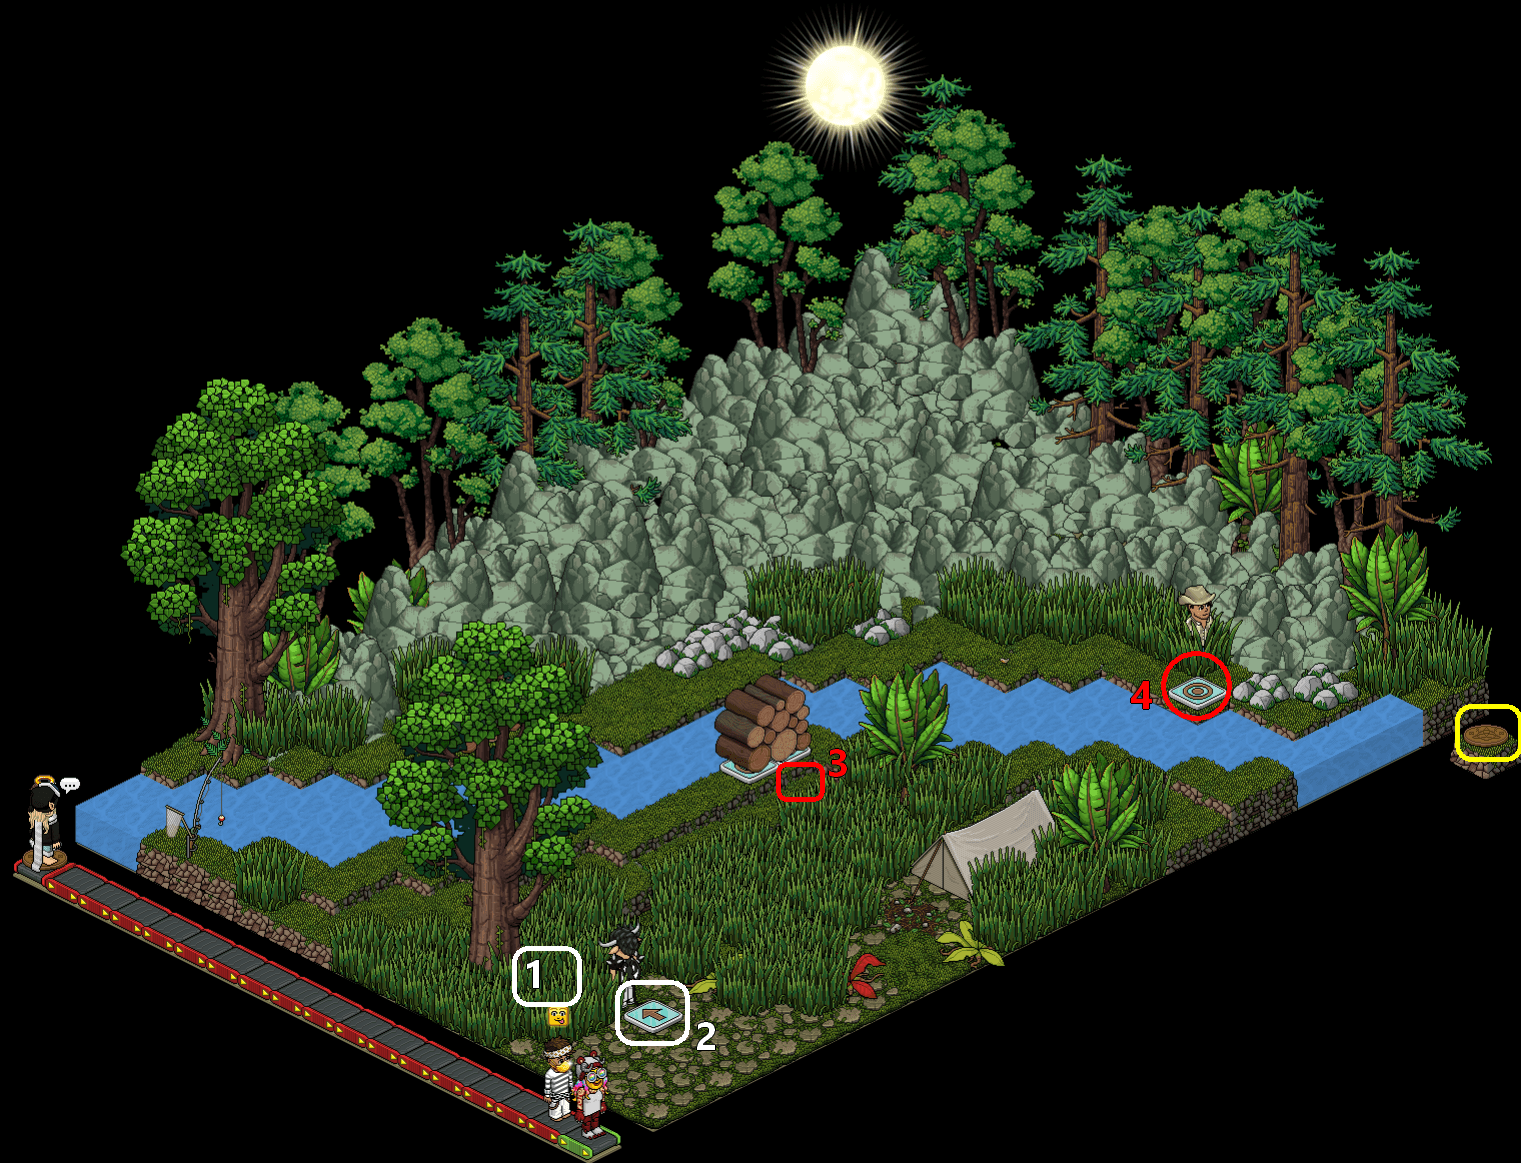 [HPLM] Brockeback Mountain